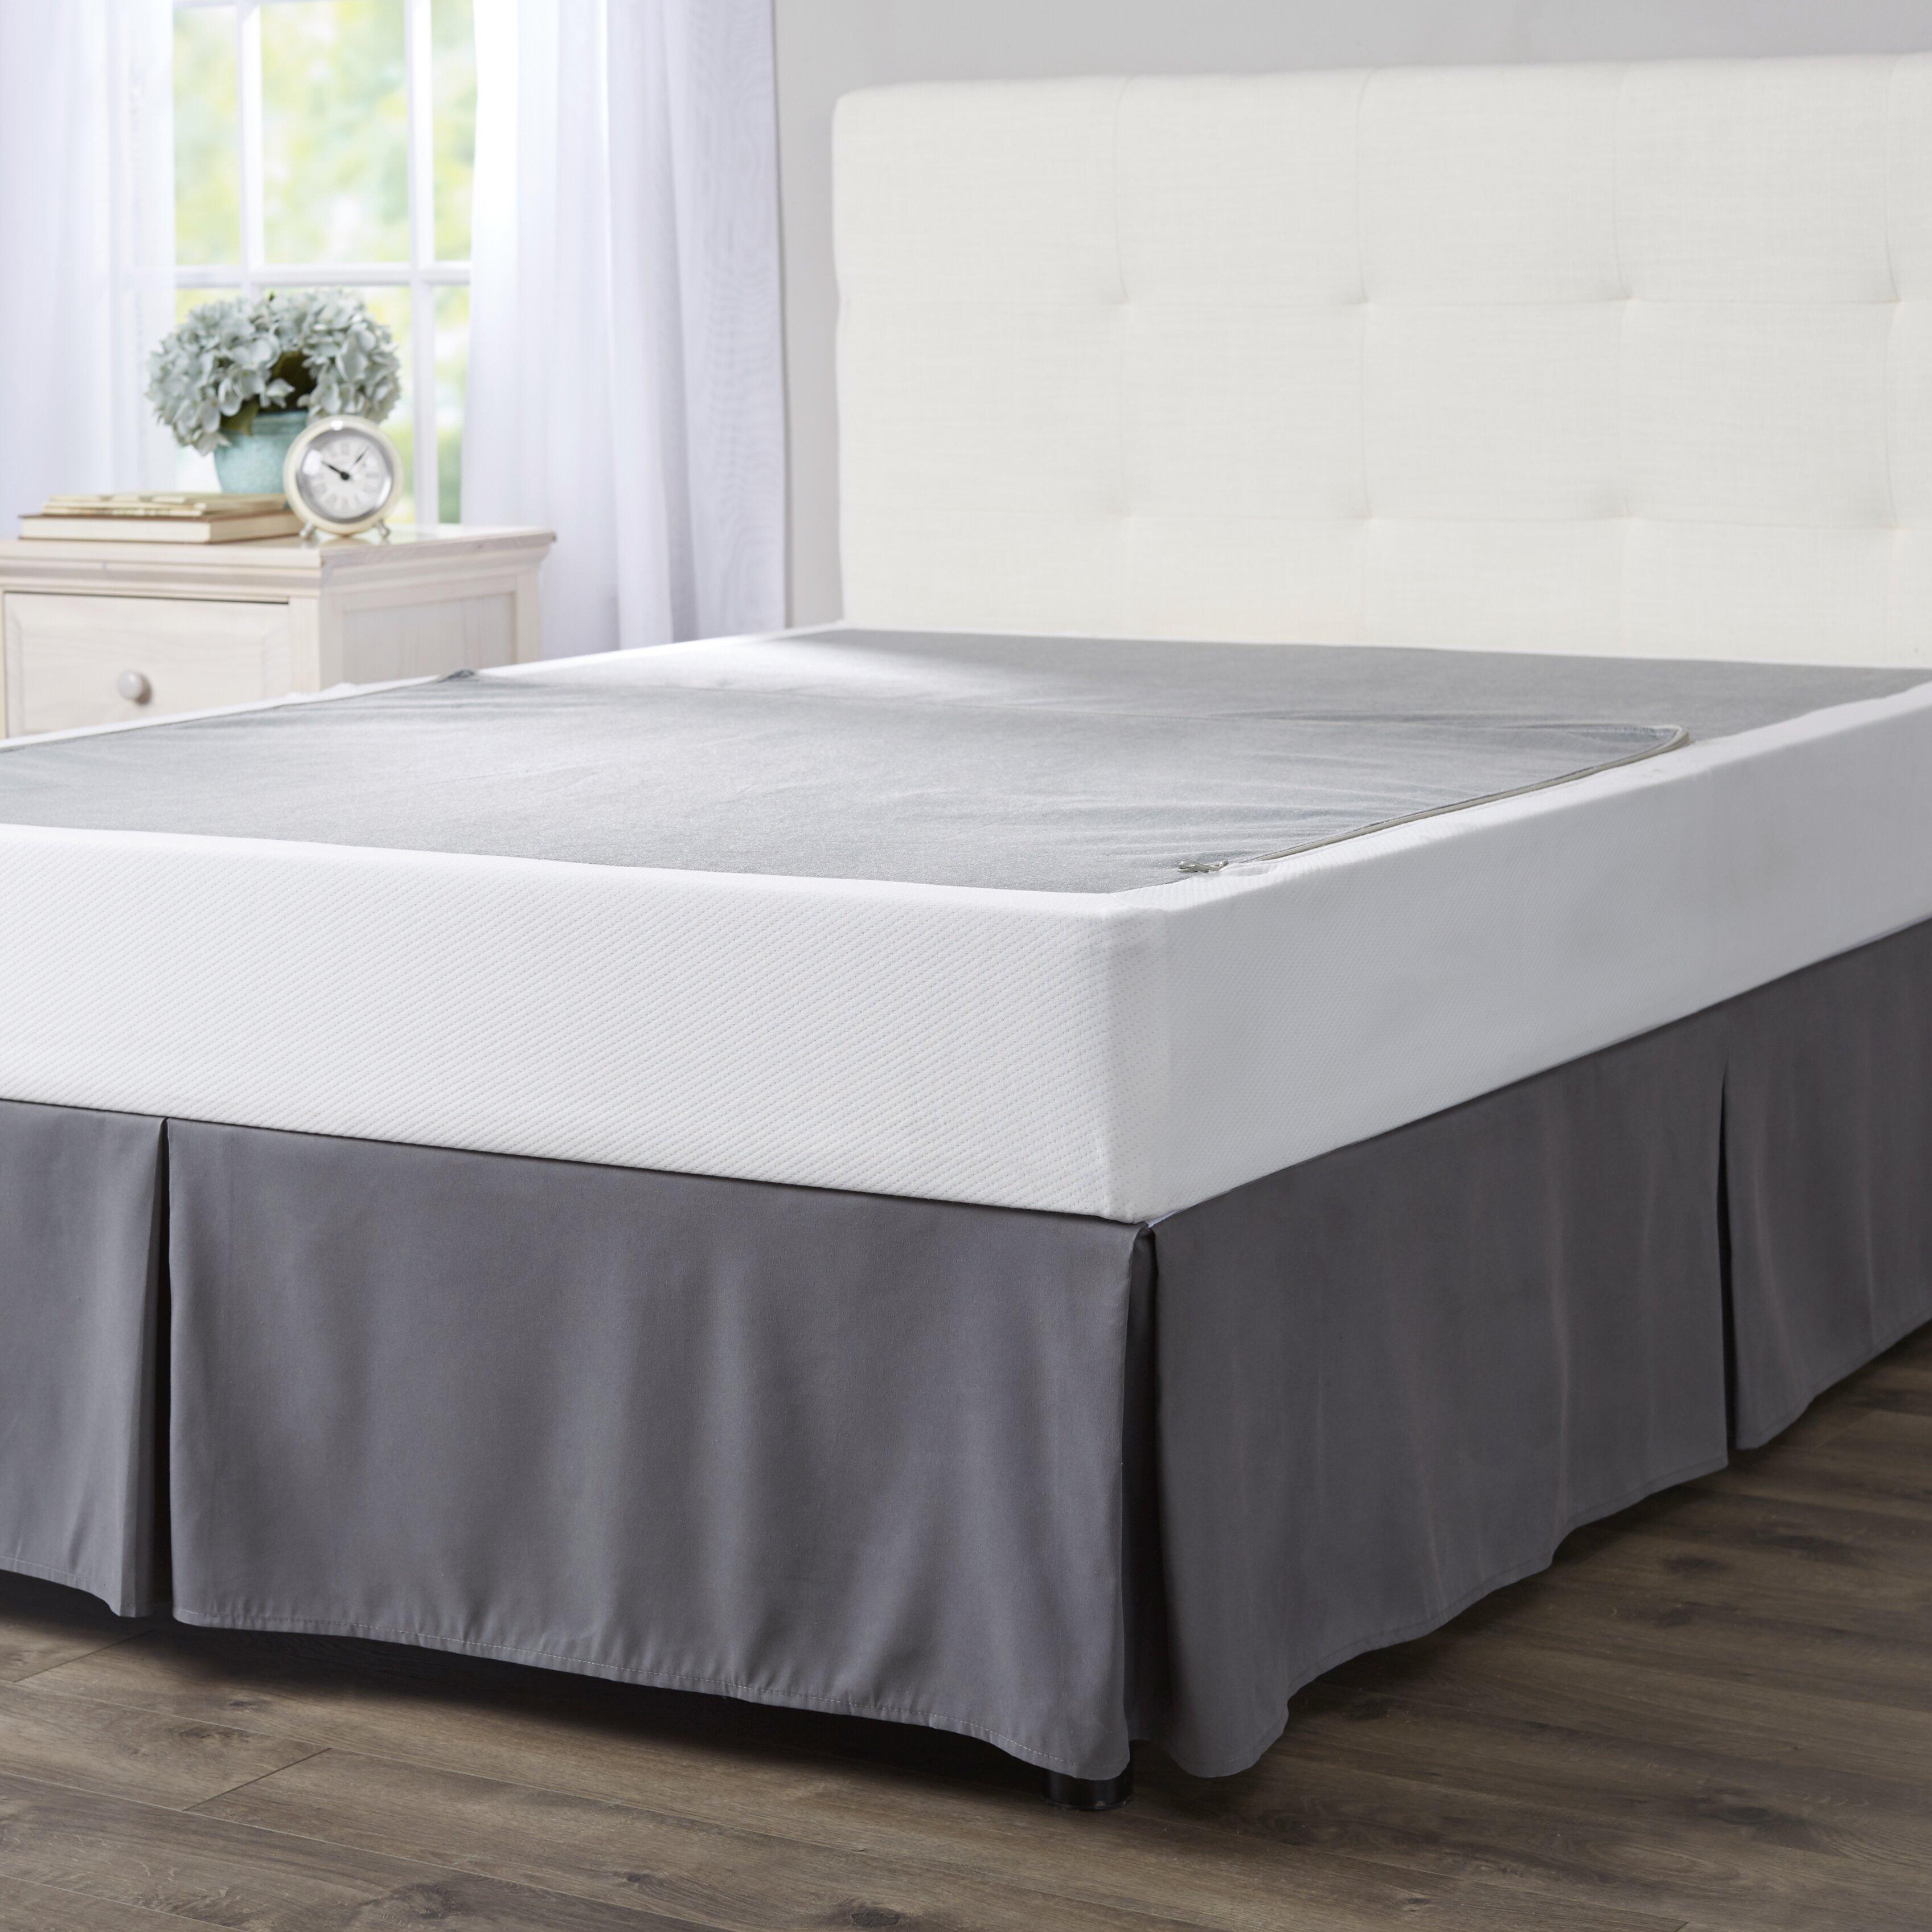 wayfair sleep wayfair sleep folding box spring reviews wayfair. Black Bedroom Furniture Sets. Home Design Ideas